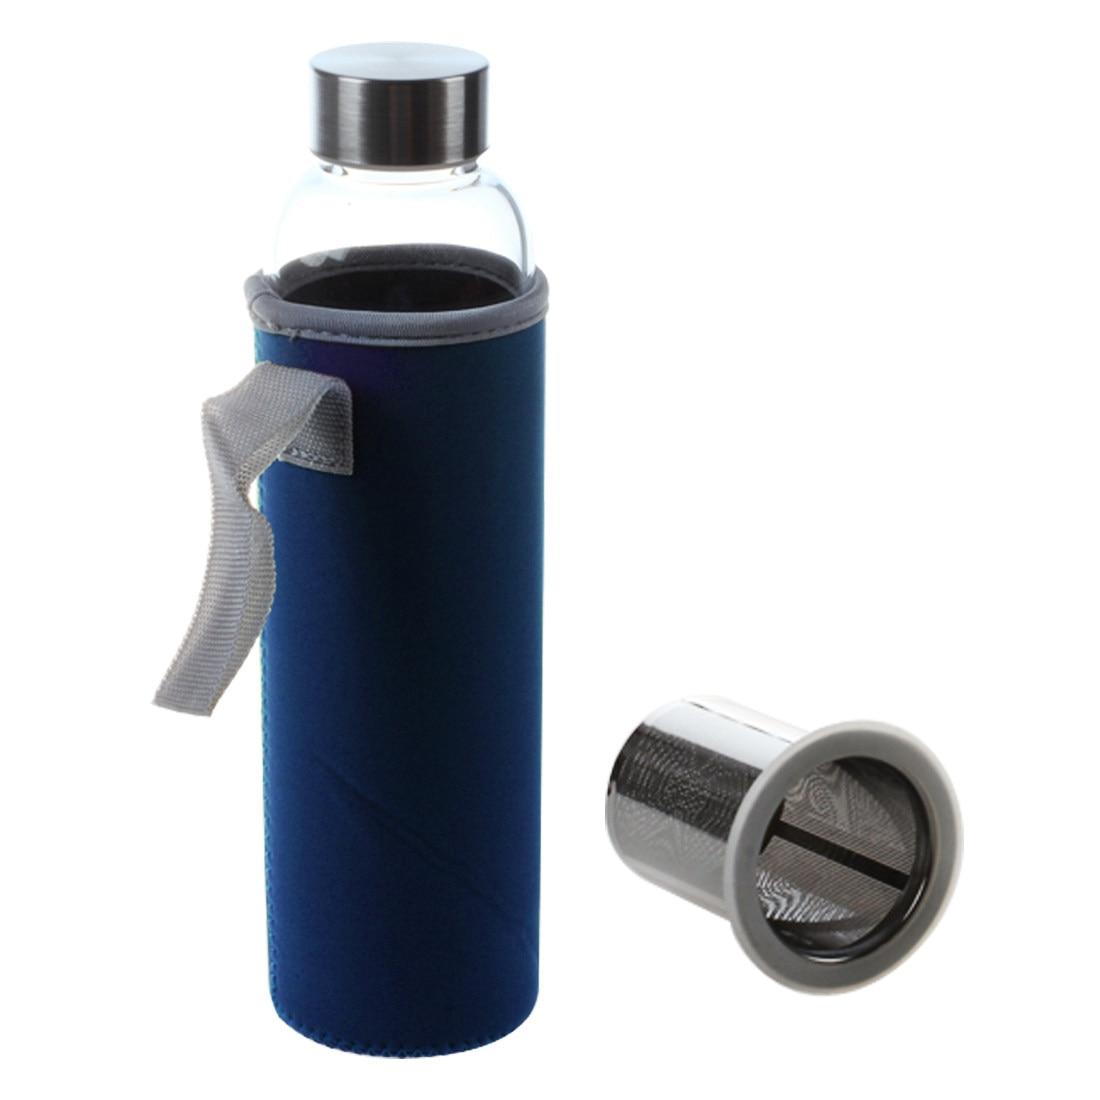 Glass Sport Water Bottle with Tea Filter Infuser Protective Bag 550ml Dark Blue